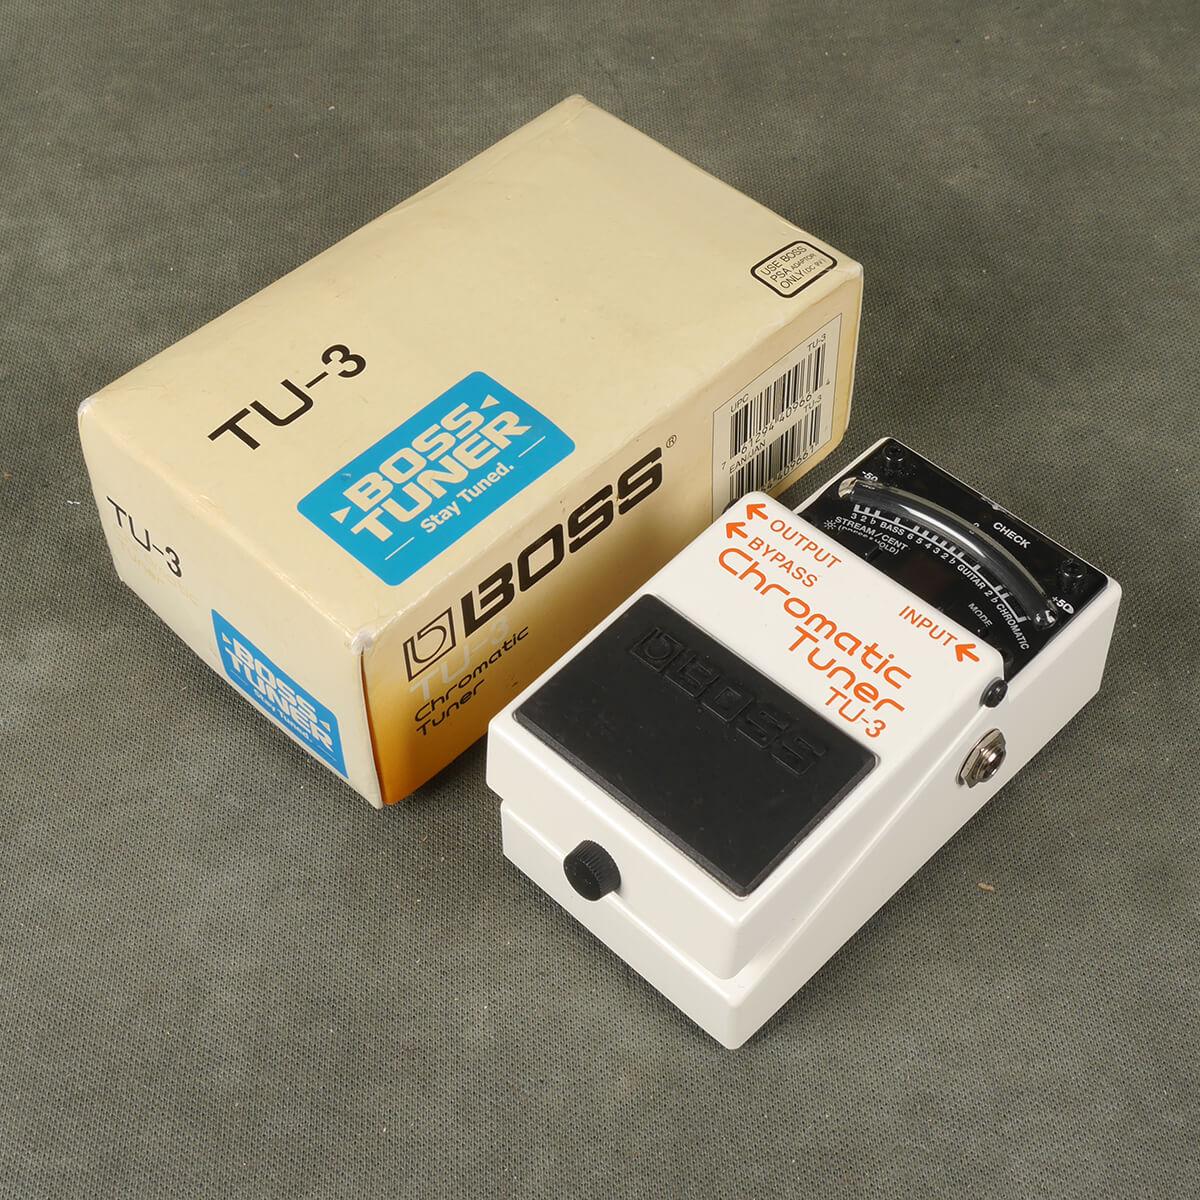 Boss TU-3 Tuner Pedal w/Box - 2nd Hand